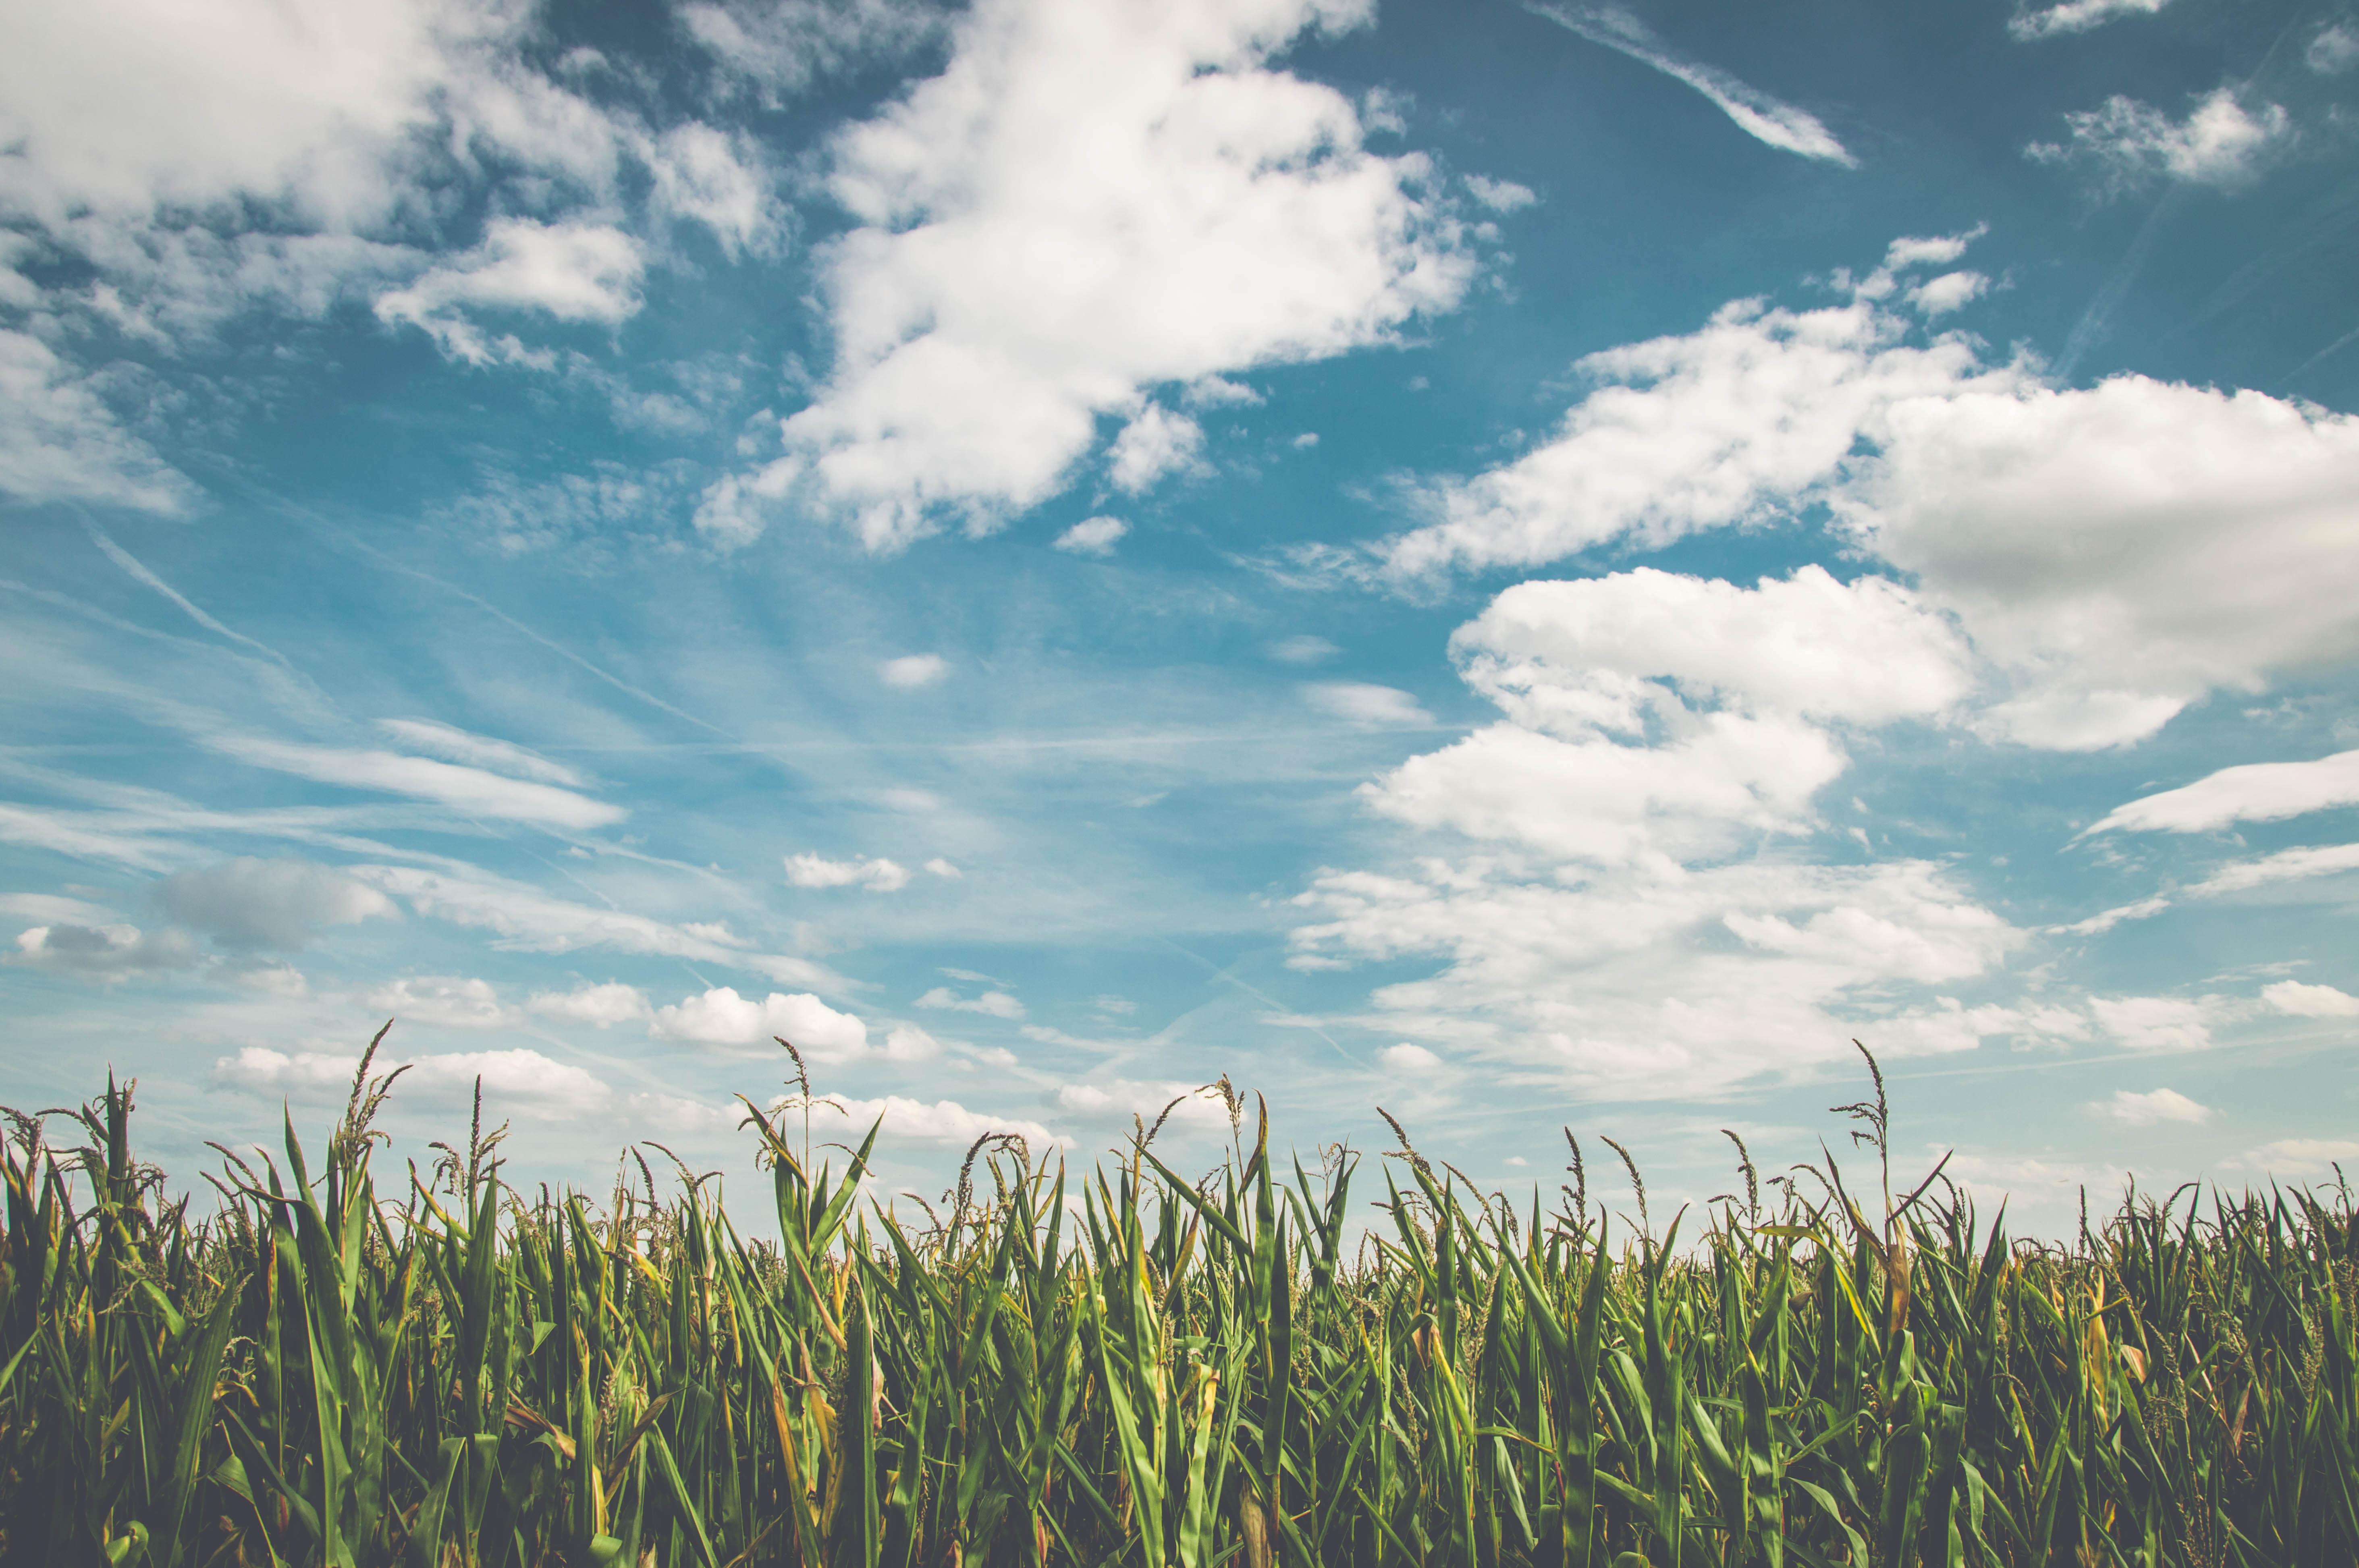 dry grass field background. Free Images : Landscape, Horizon, Cloud, Plant, Sky, Sun, Field, Meadow, Prairie, Sunlight, Air, Flower, Wind, Summer, Dry, Food, Green, Crop, Autumn, Dry Grass Field Background D